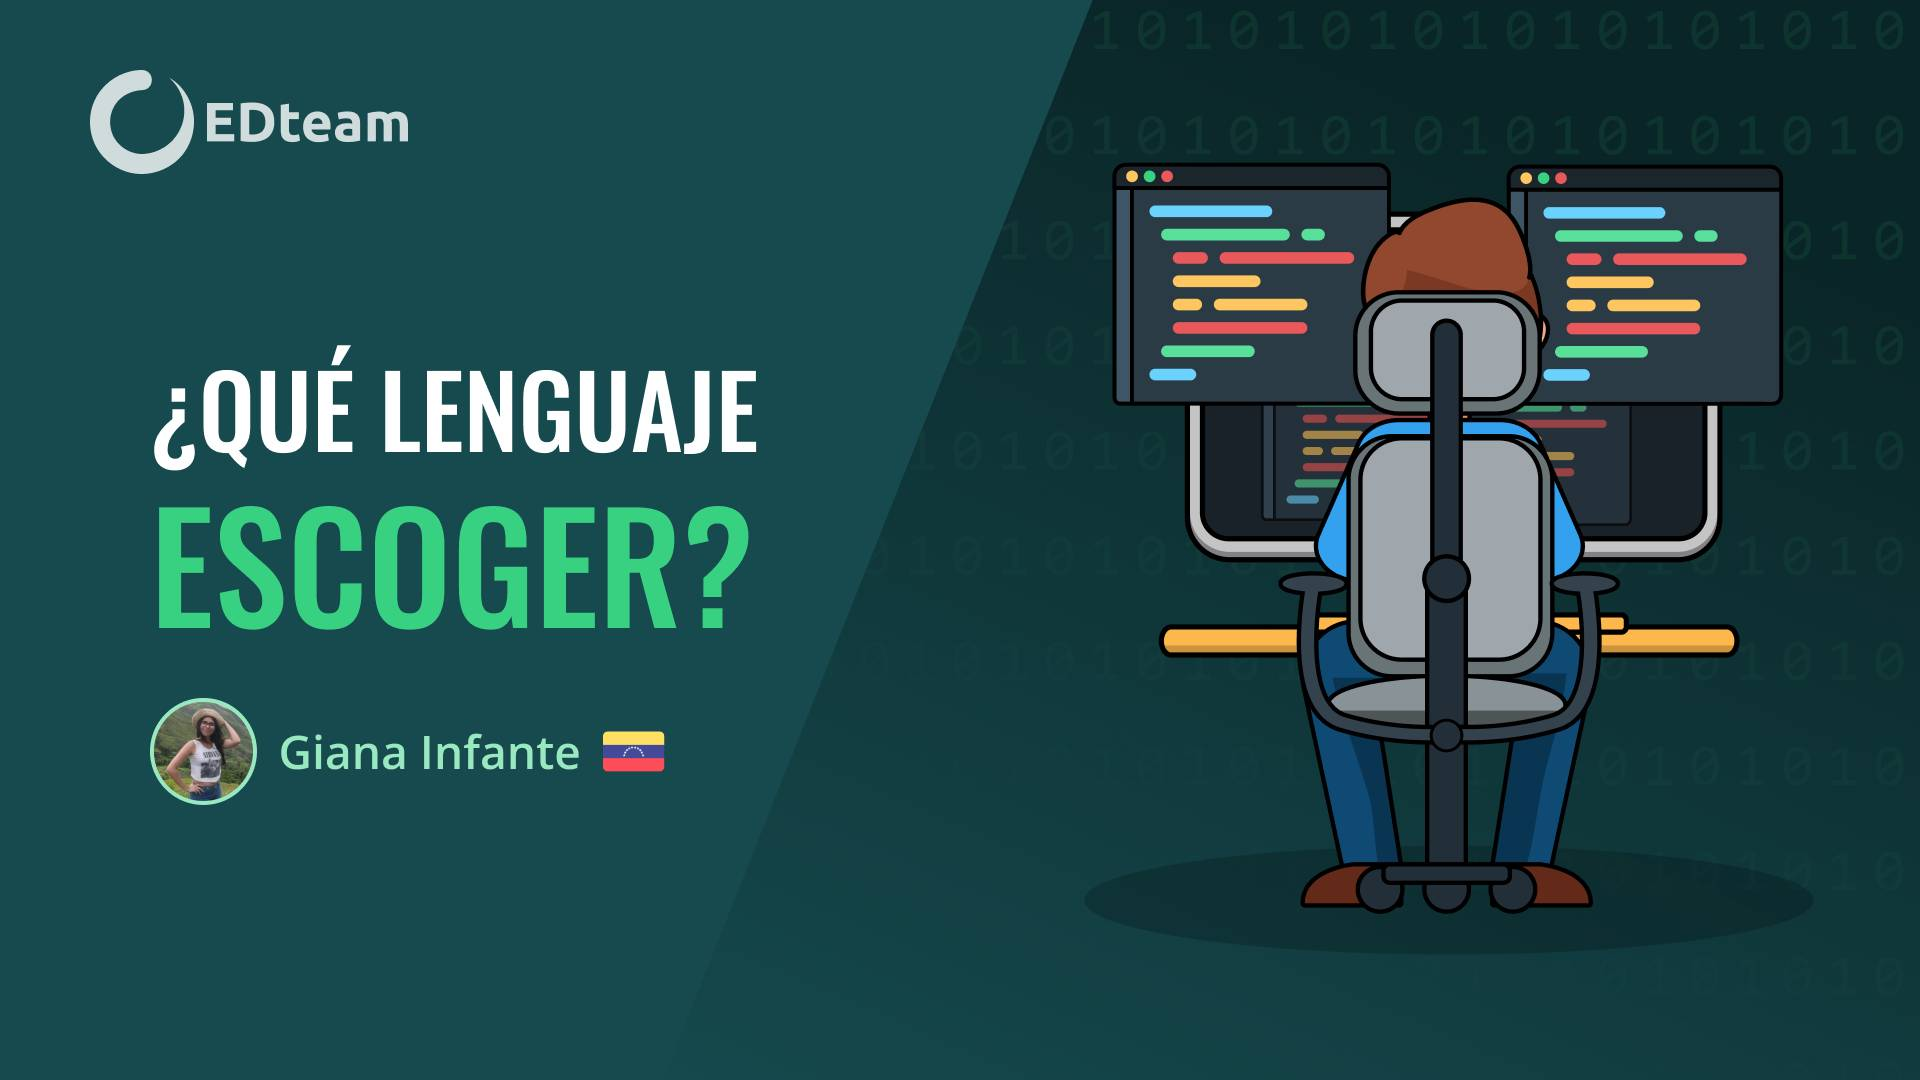 ¿Con qué lenguaje aprender a programar?